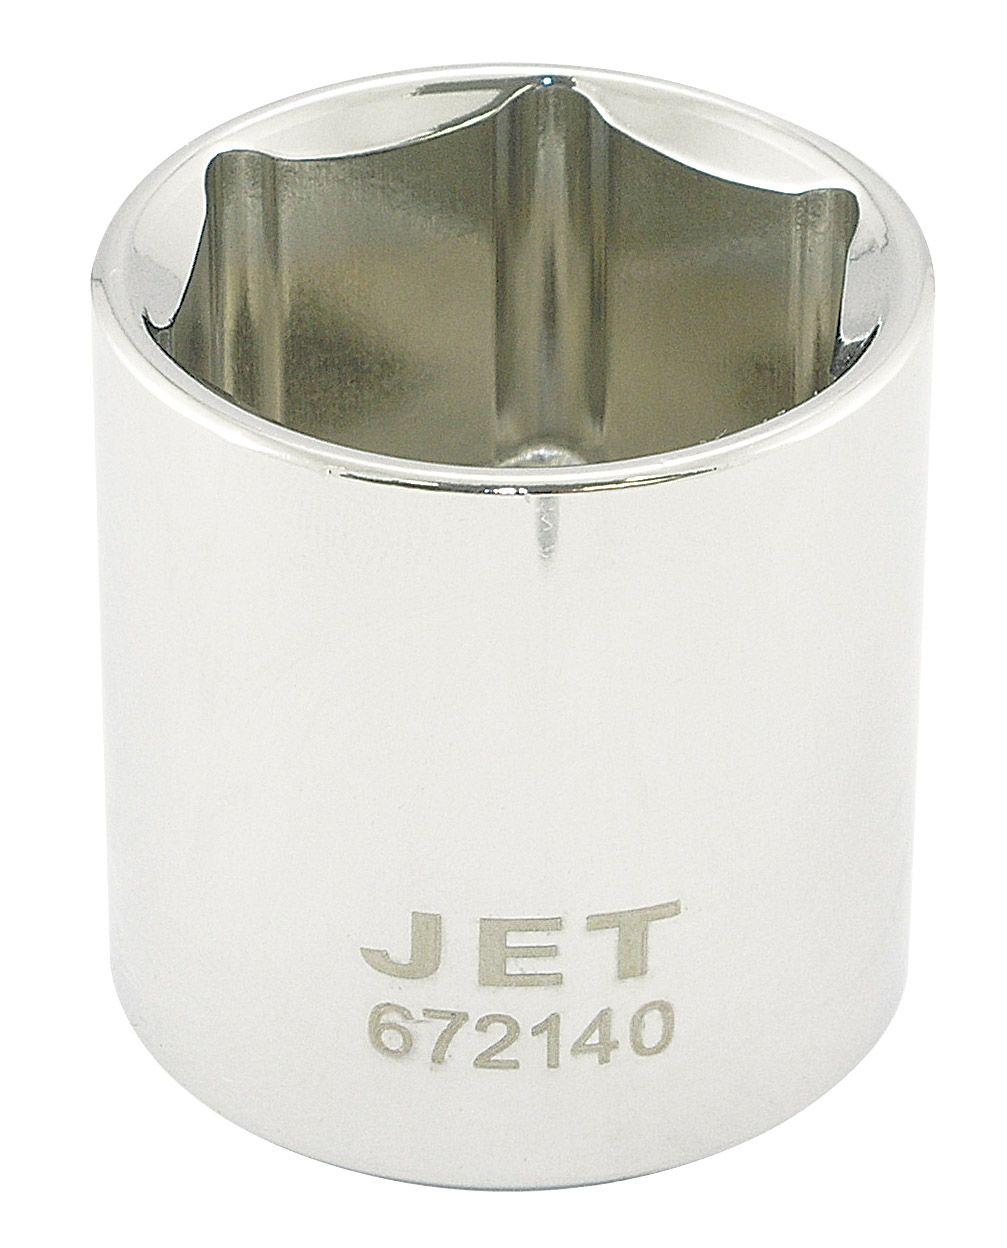 Jet 672140 Douille 1 1/4